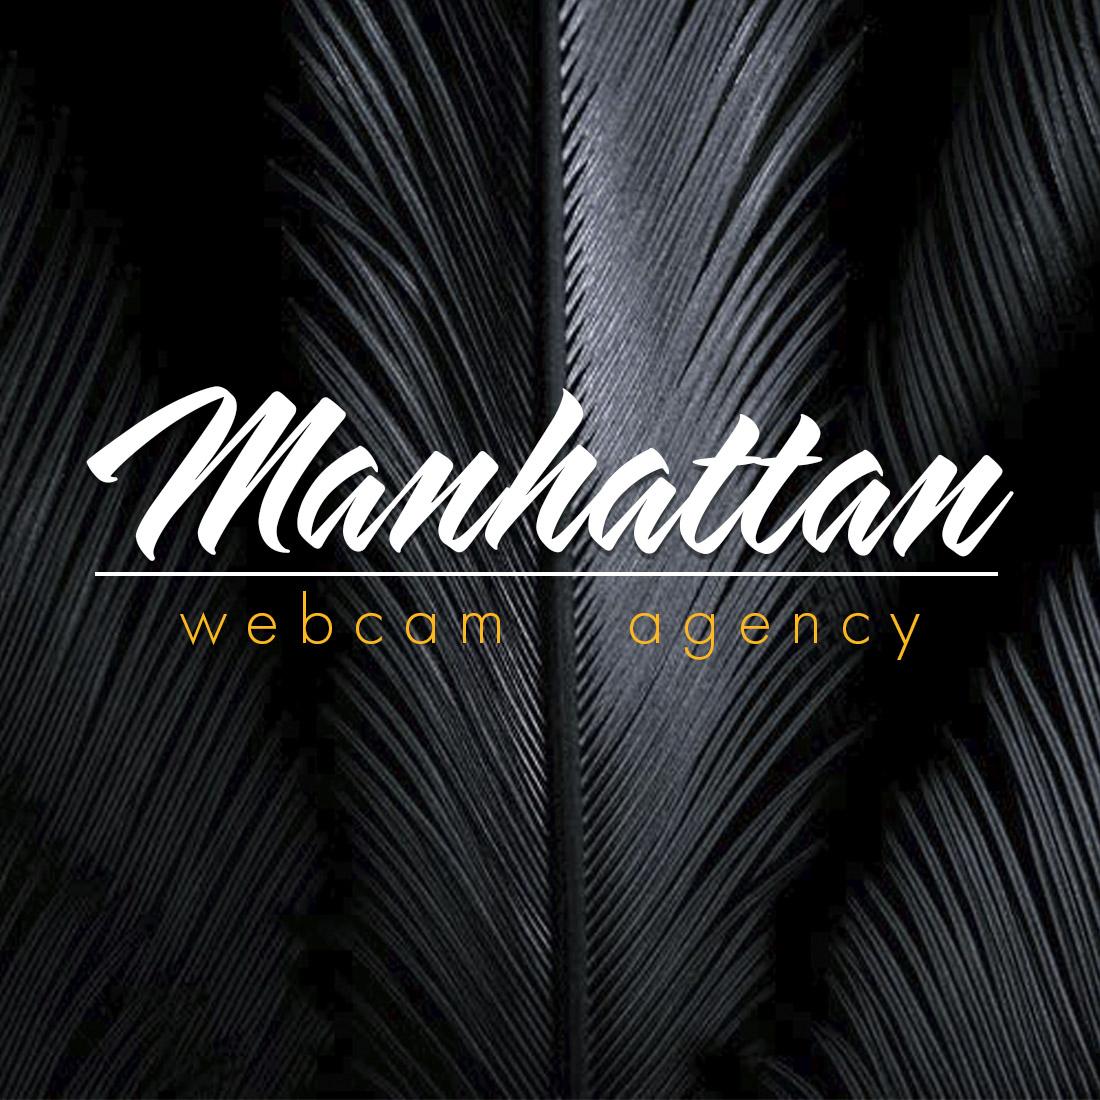 вебкам студия Manhattan